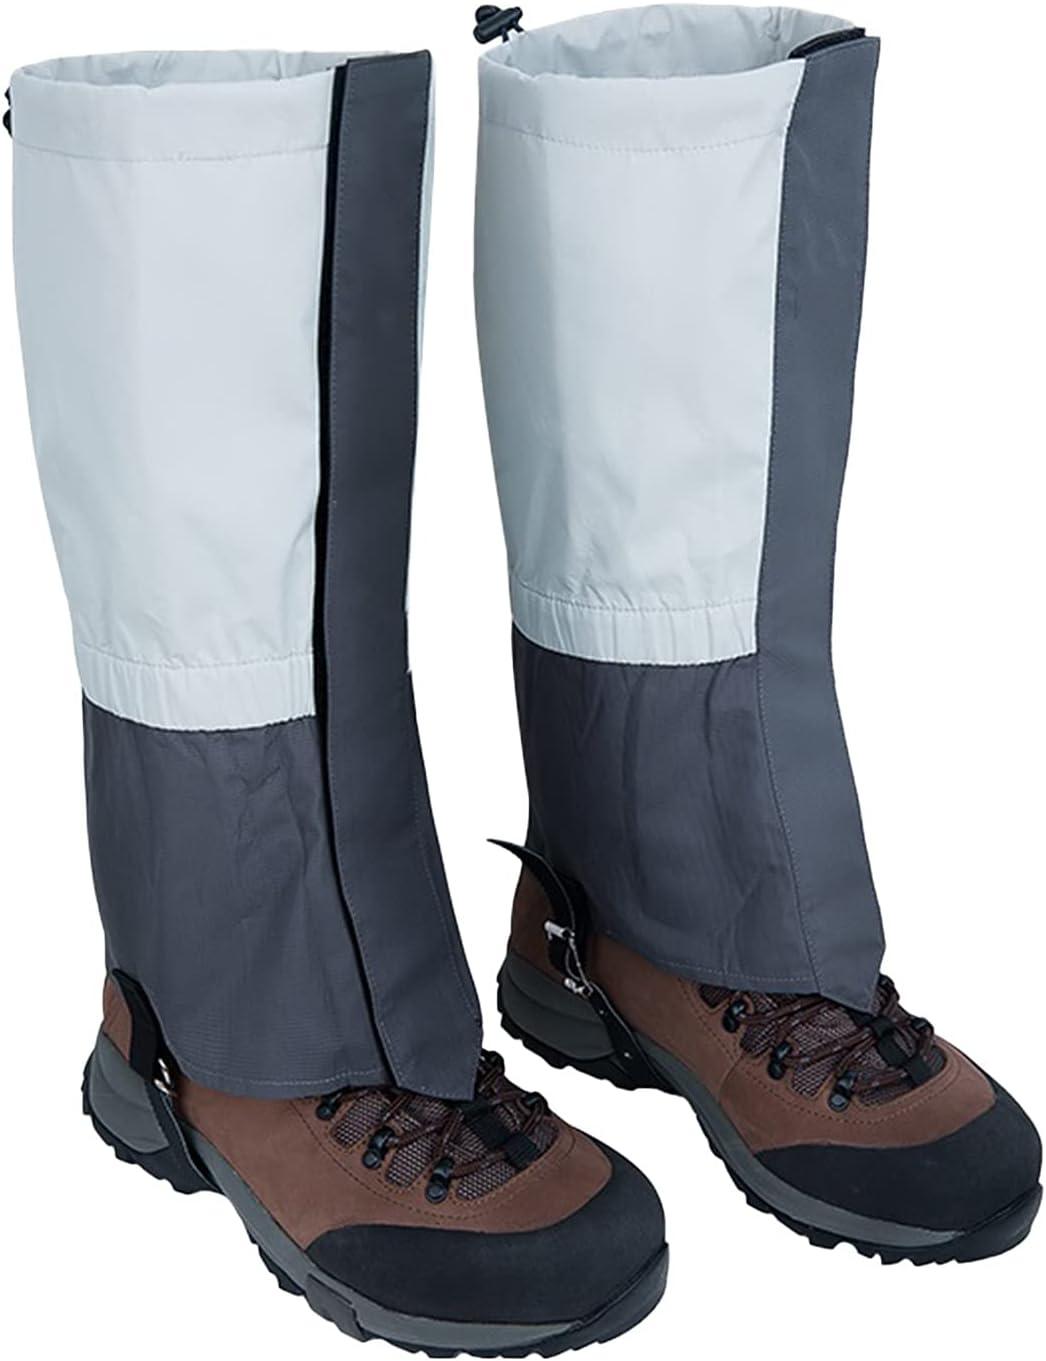 Outdoor Japan Maker New Cheap bargain Waterproof Leg Gaiters Guards Legg Breathable Hiking